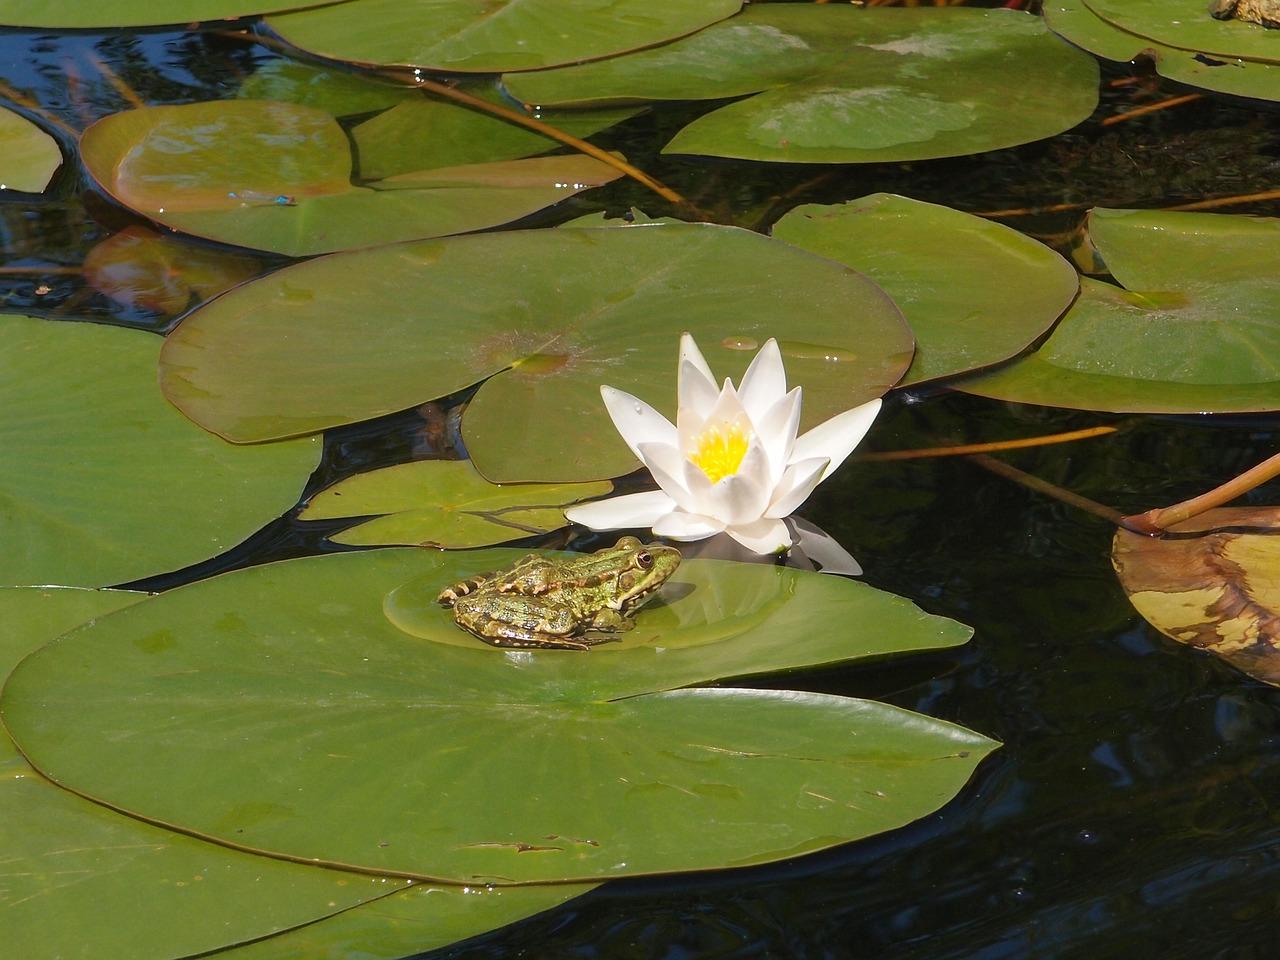 Waterriverwater Liliesfrogamphibian Free Photo From Needpix